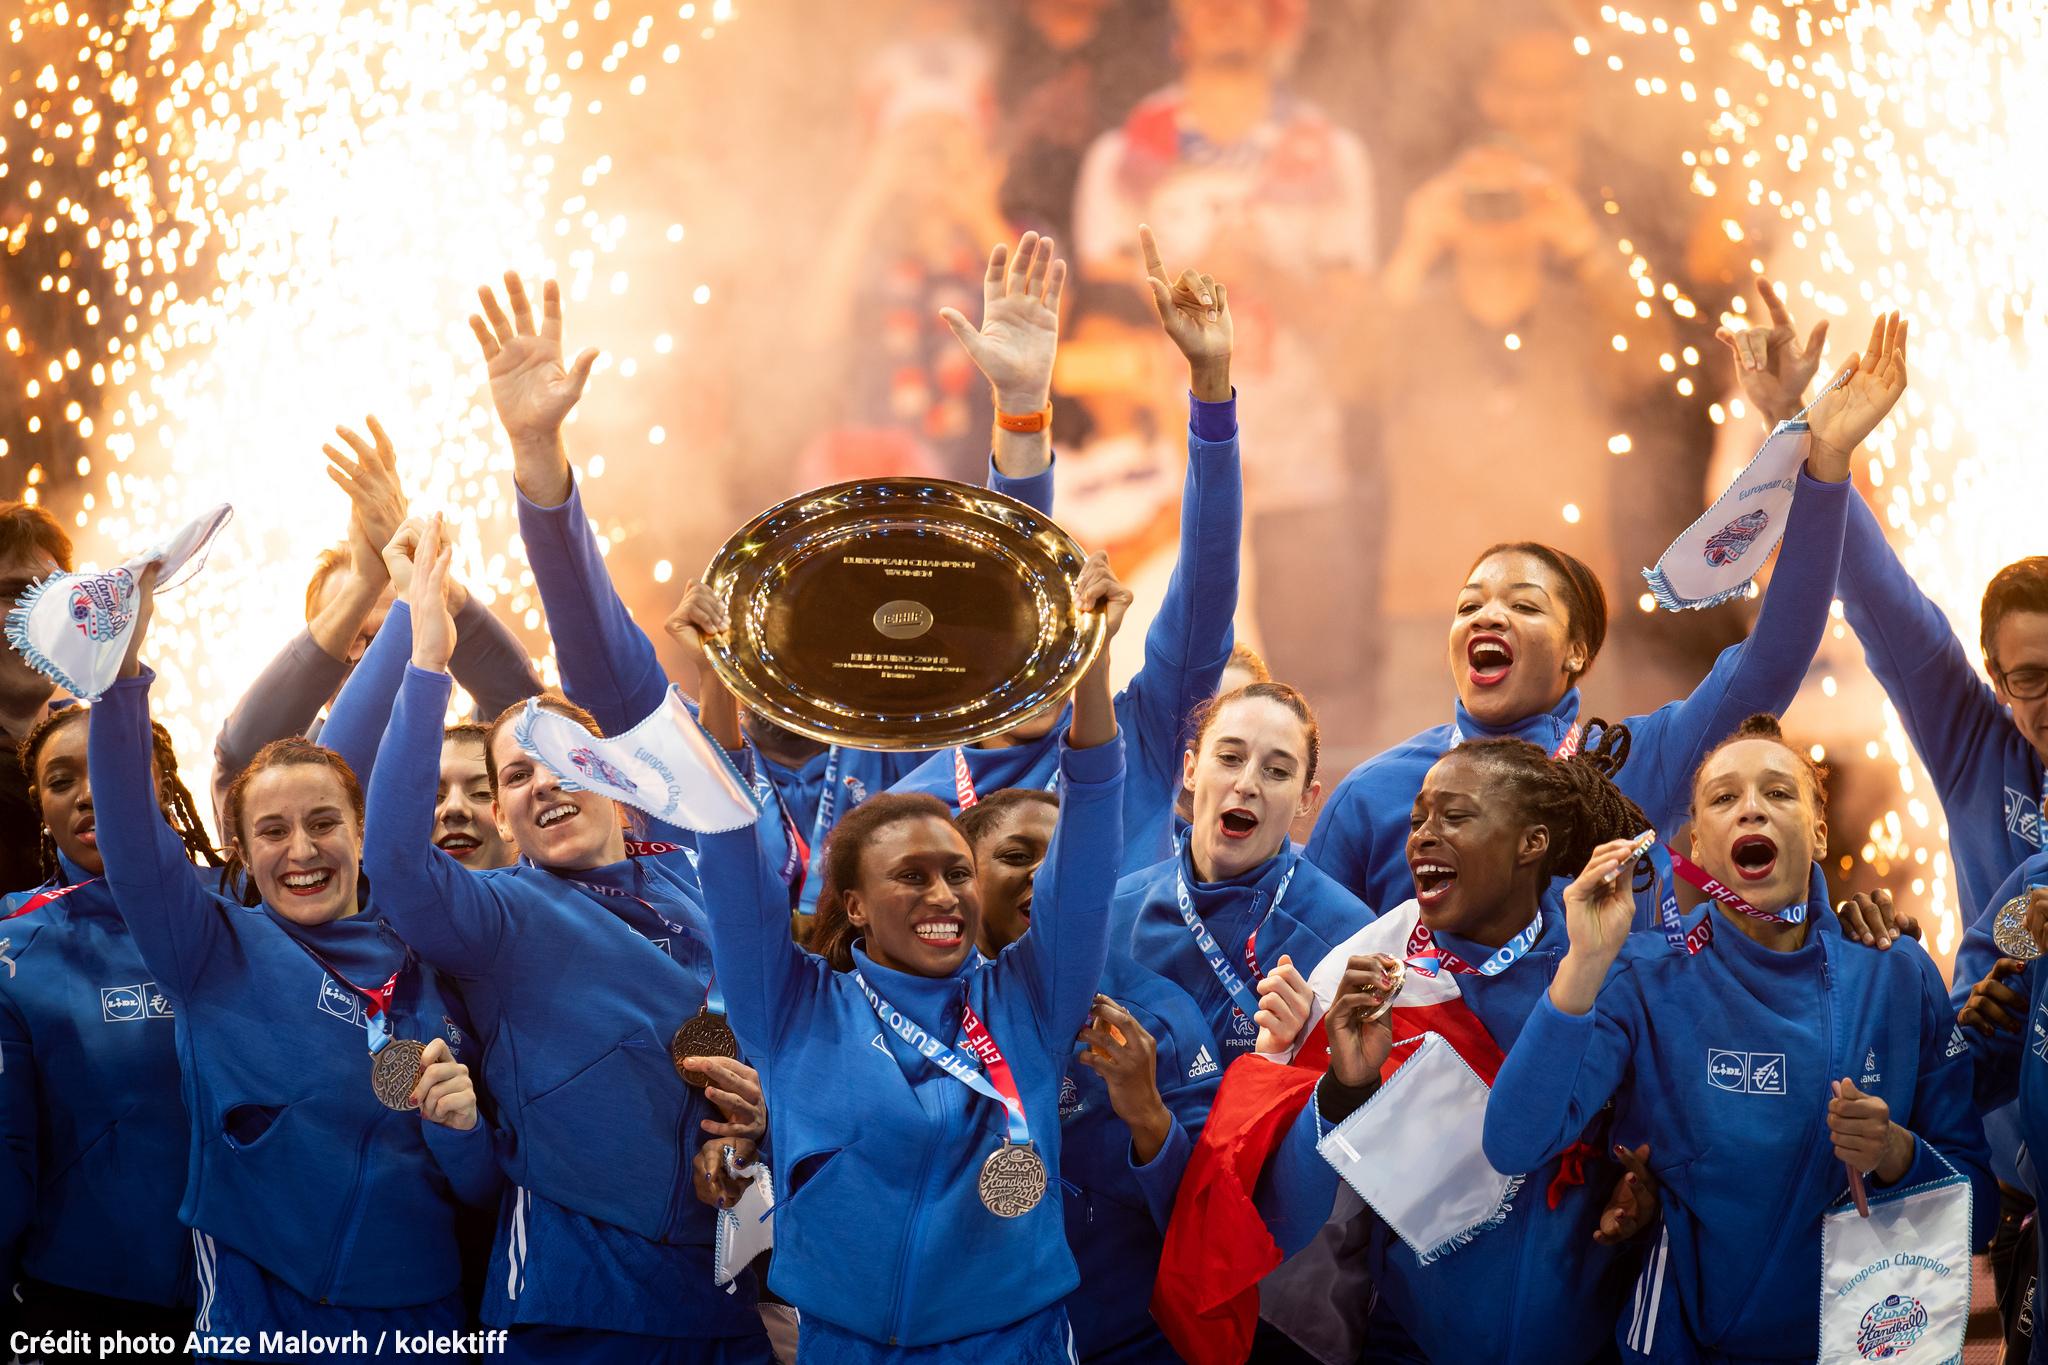 Championnes d'Europe 2018 (Photos Flickr)